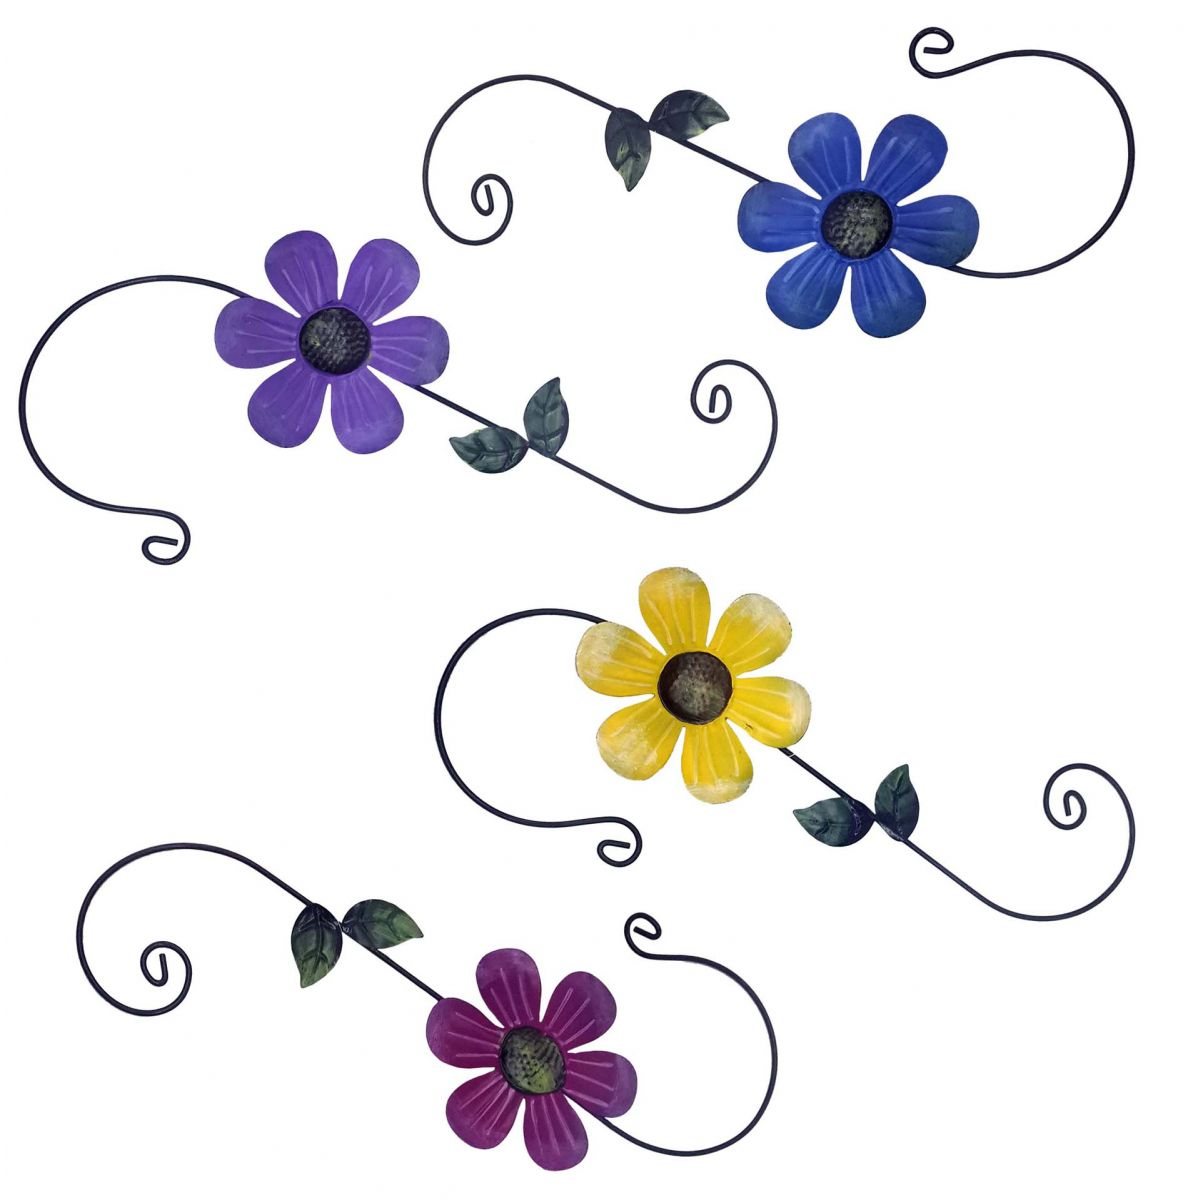 Enfeite de Metal Para Jardim Casa Quintal Flor Para Pendurar Cor Variada 4 Unid